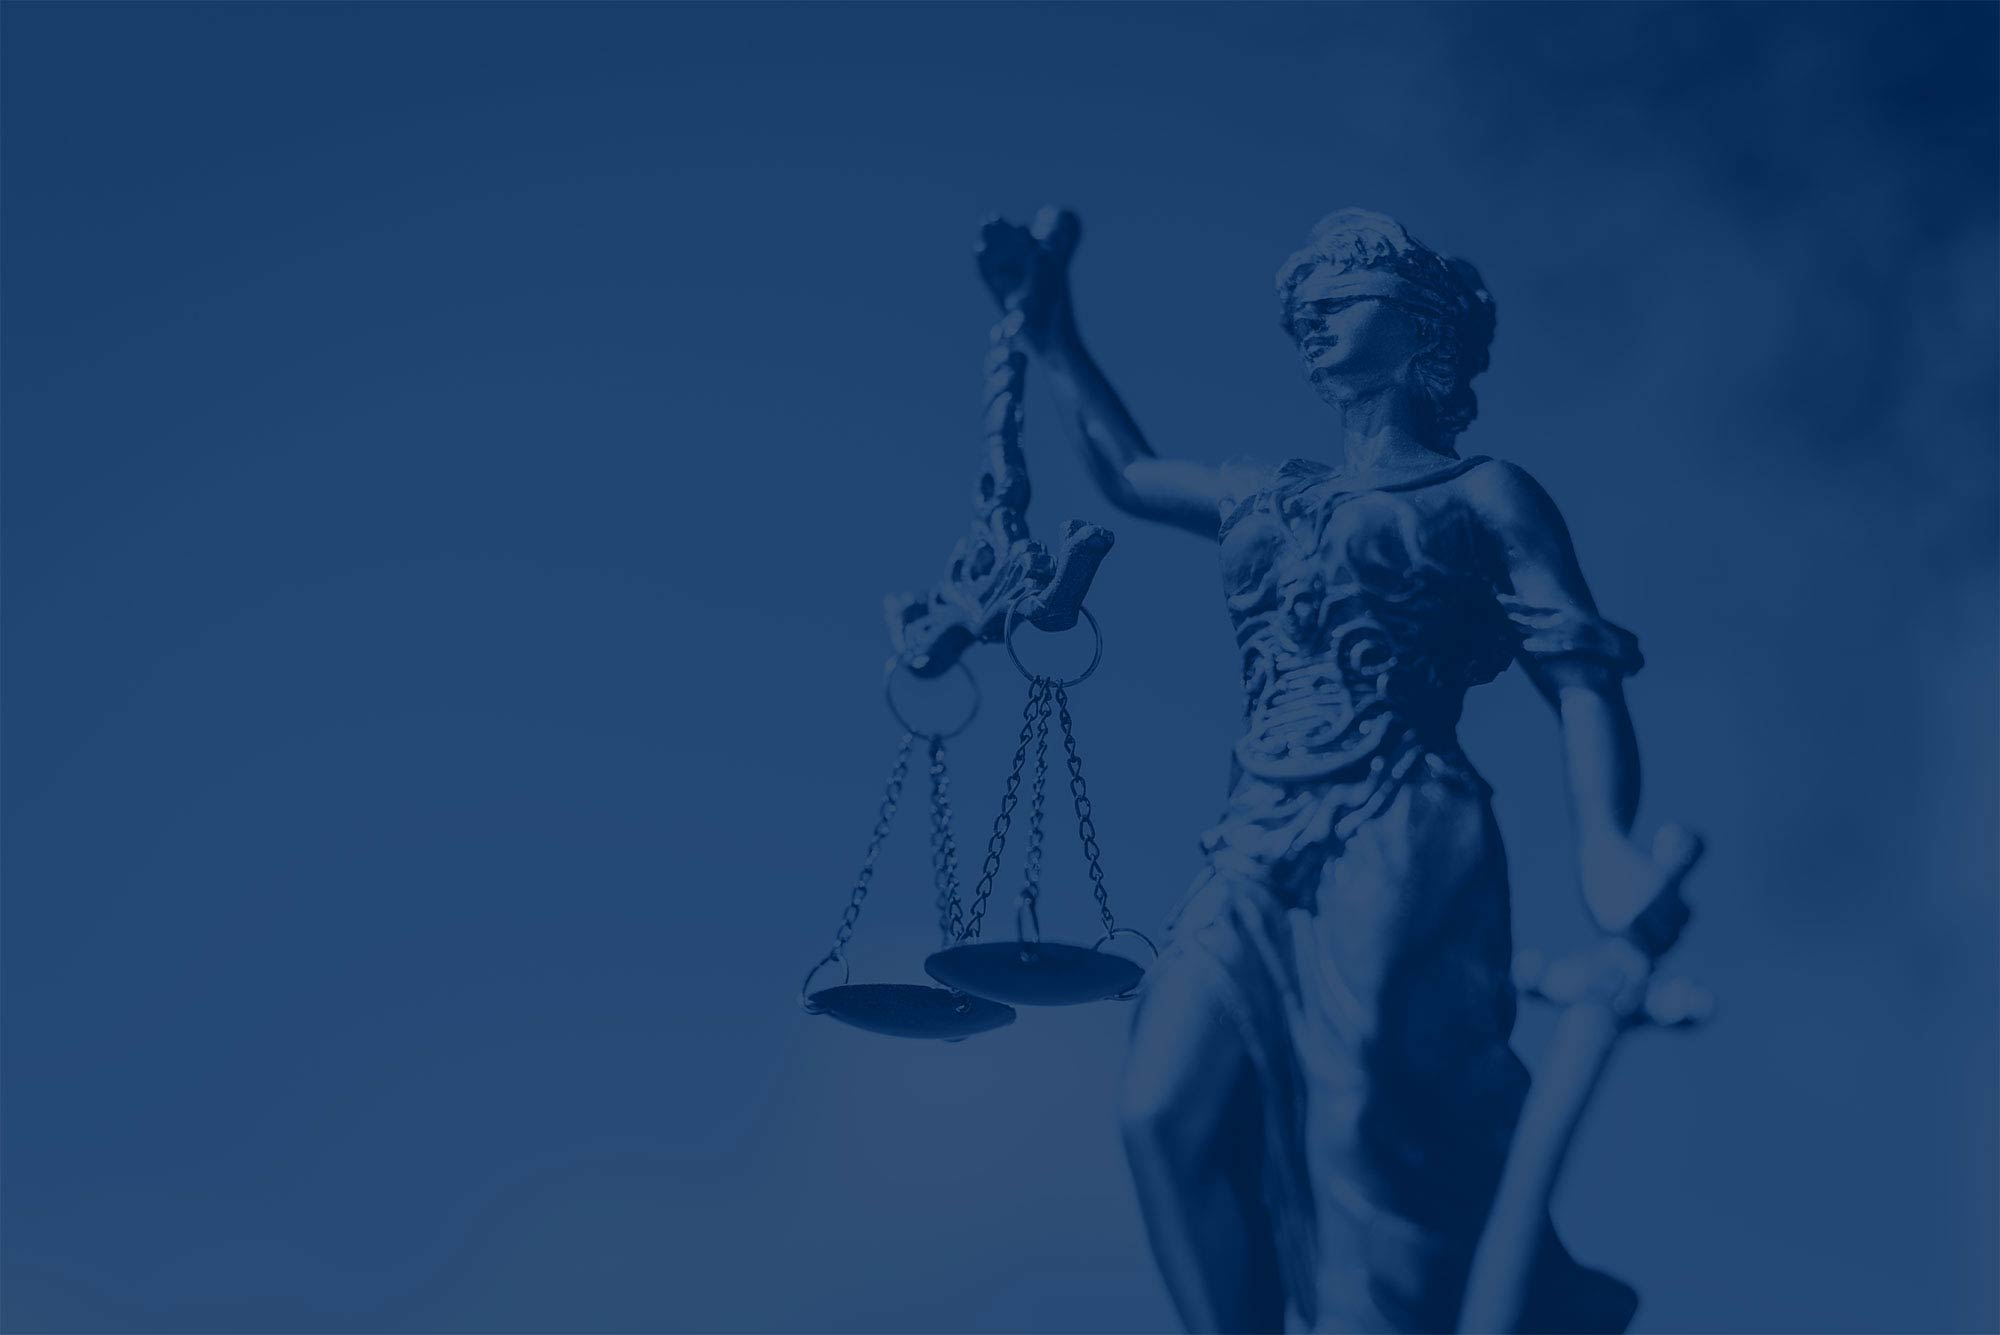 Rechtsanwalt Clemens Louis sexuelle Handlungen vor Kindern